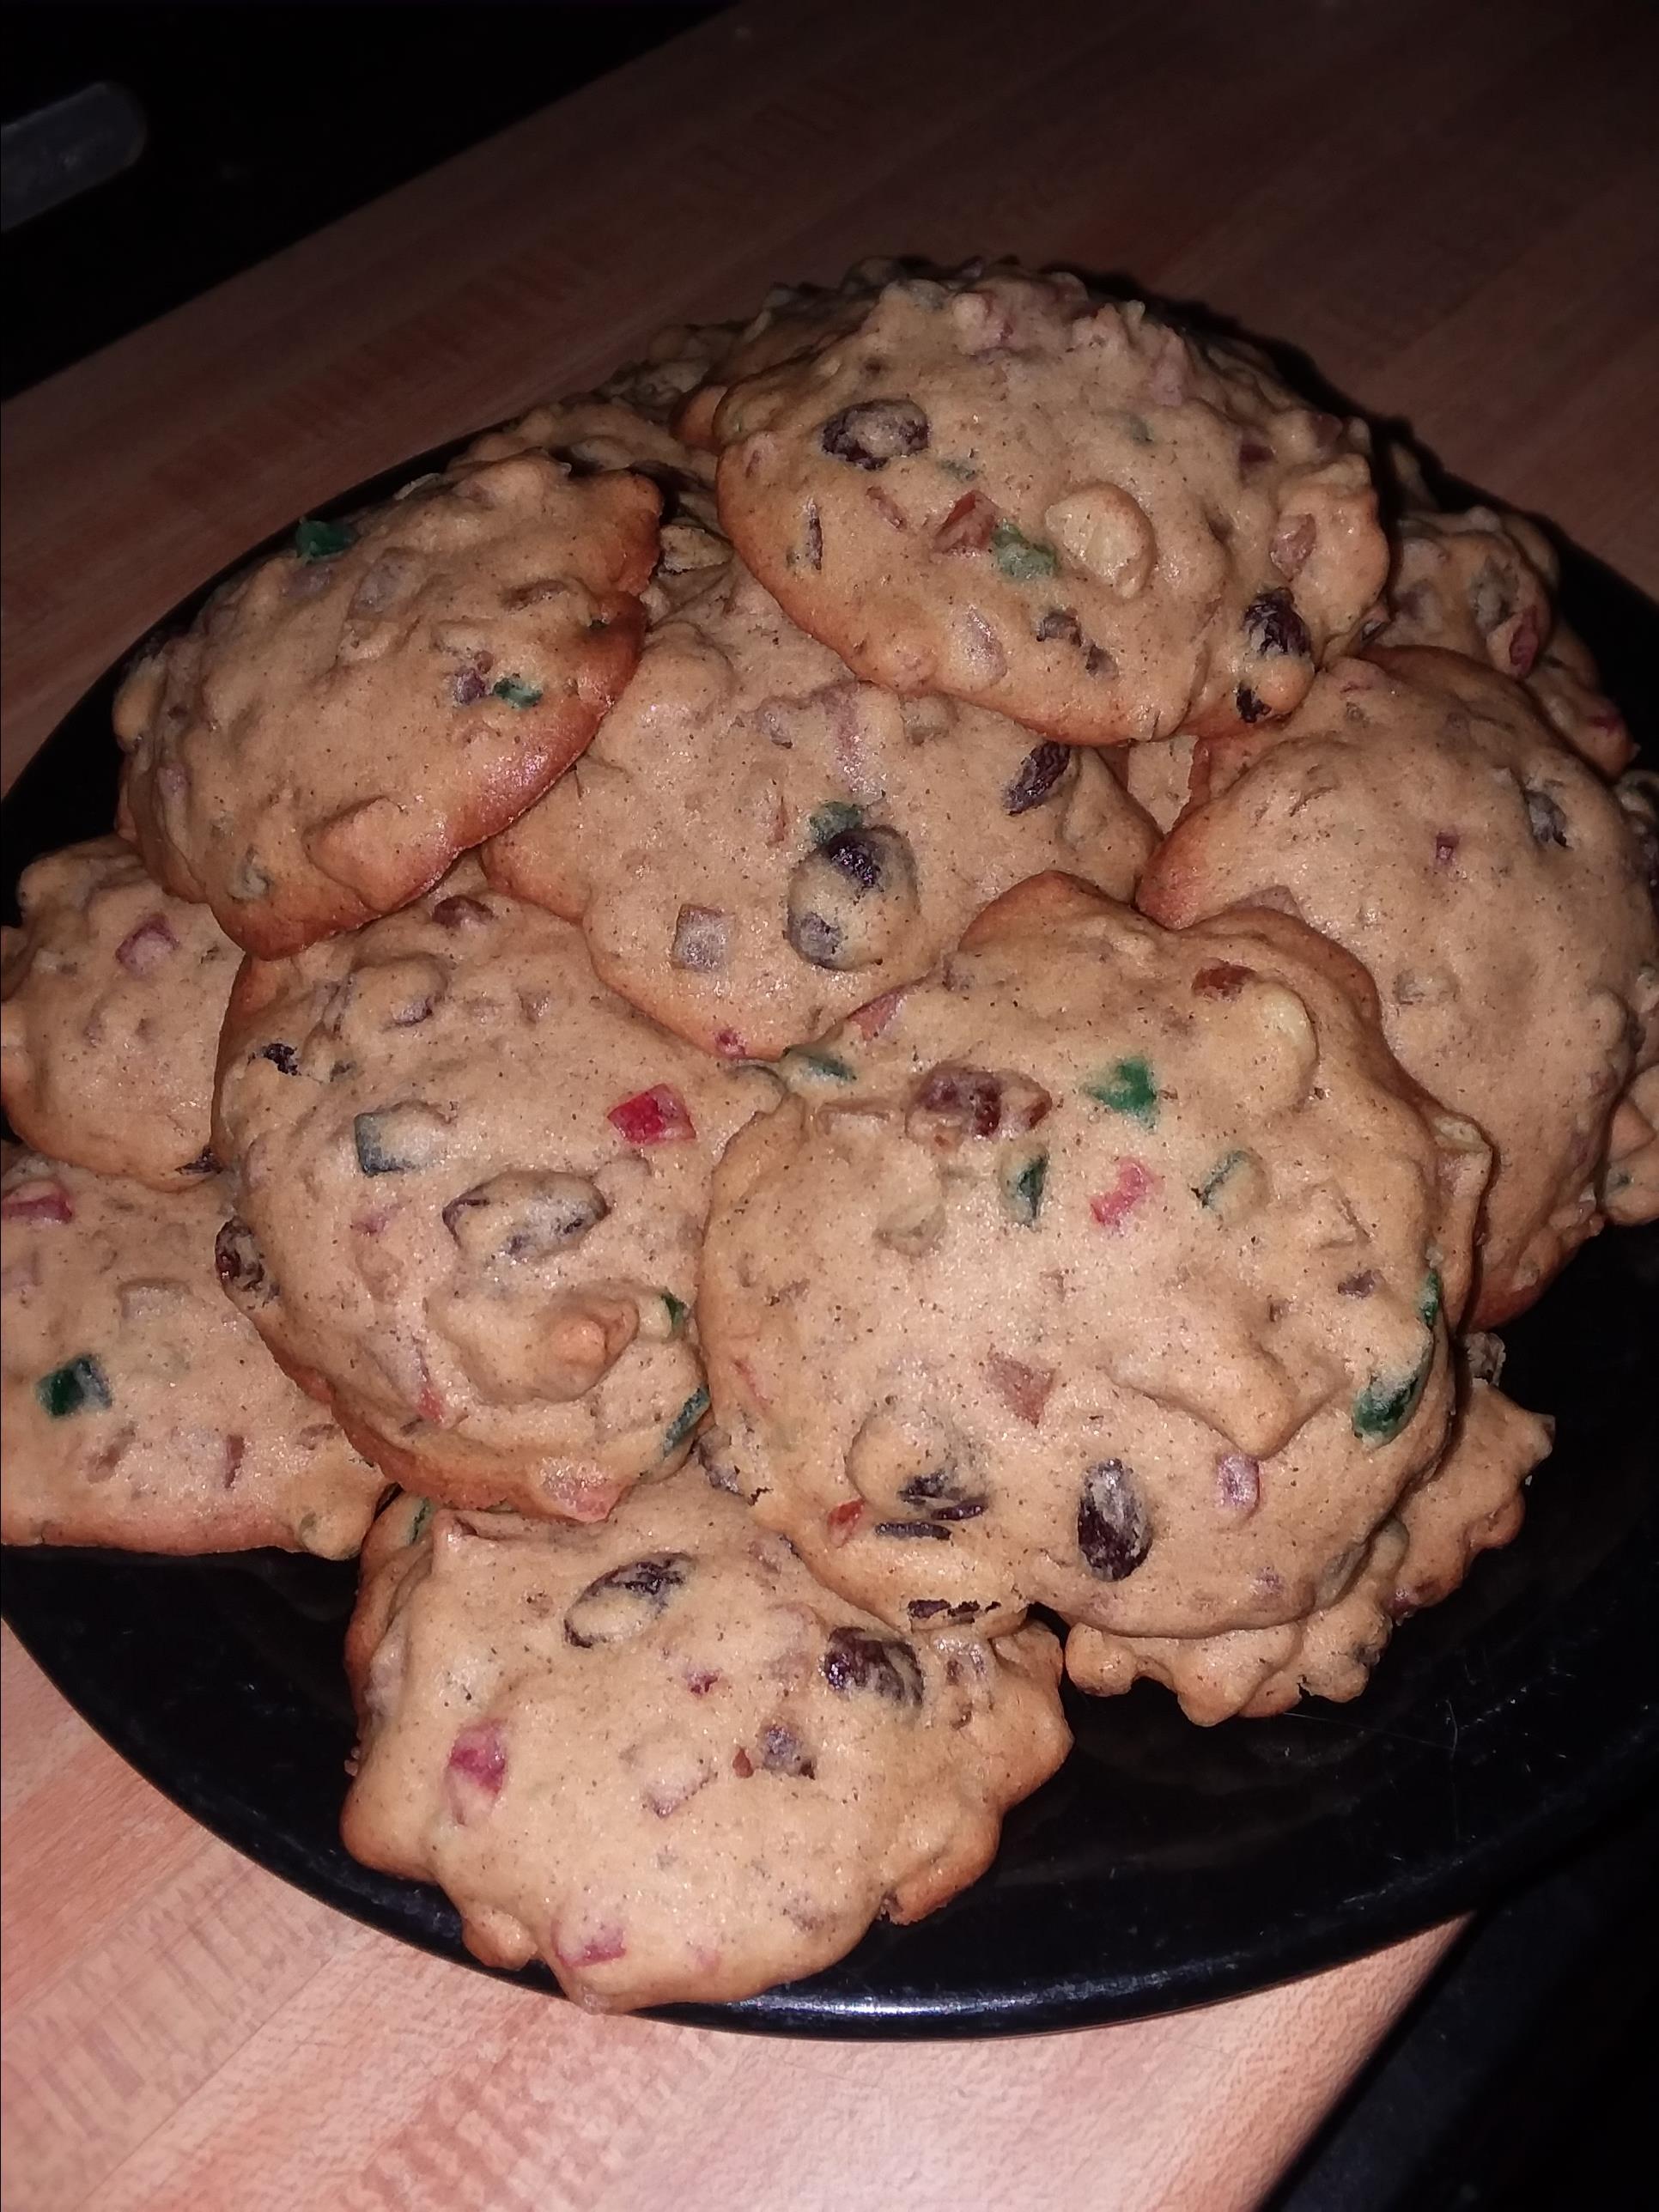 My Grandma's Fruitcake Cookies